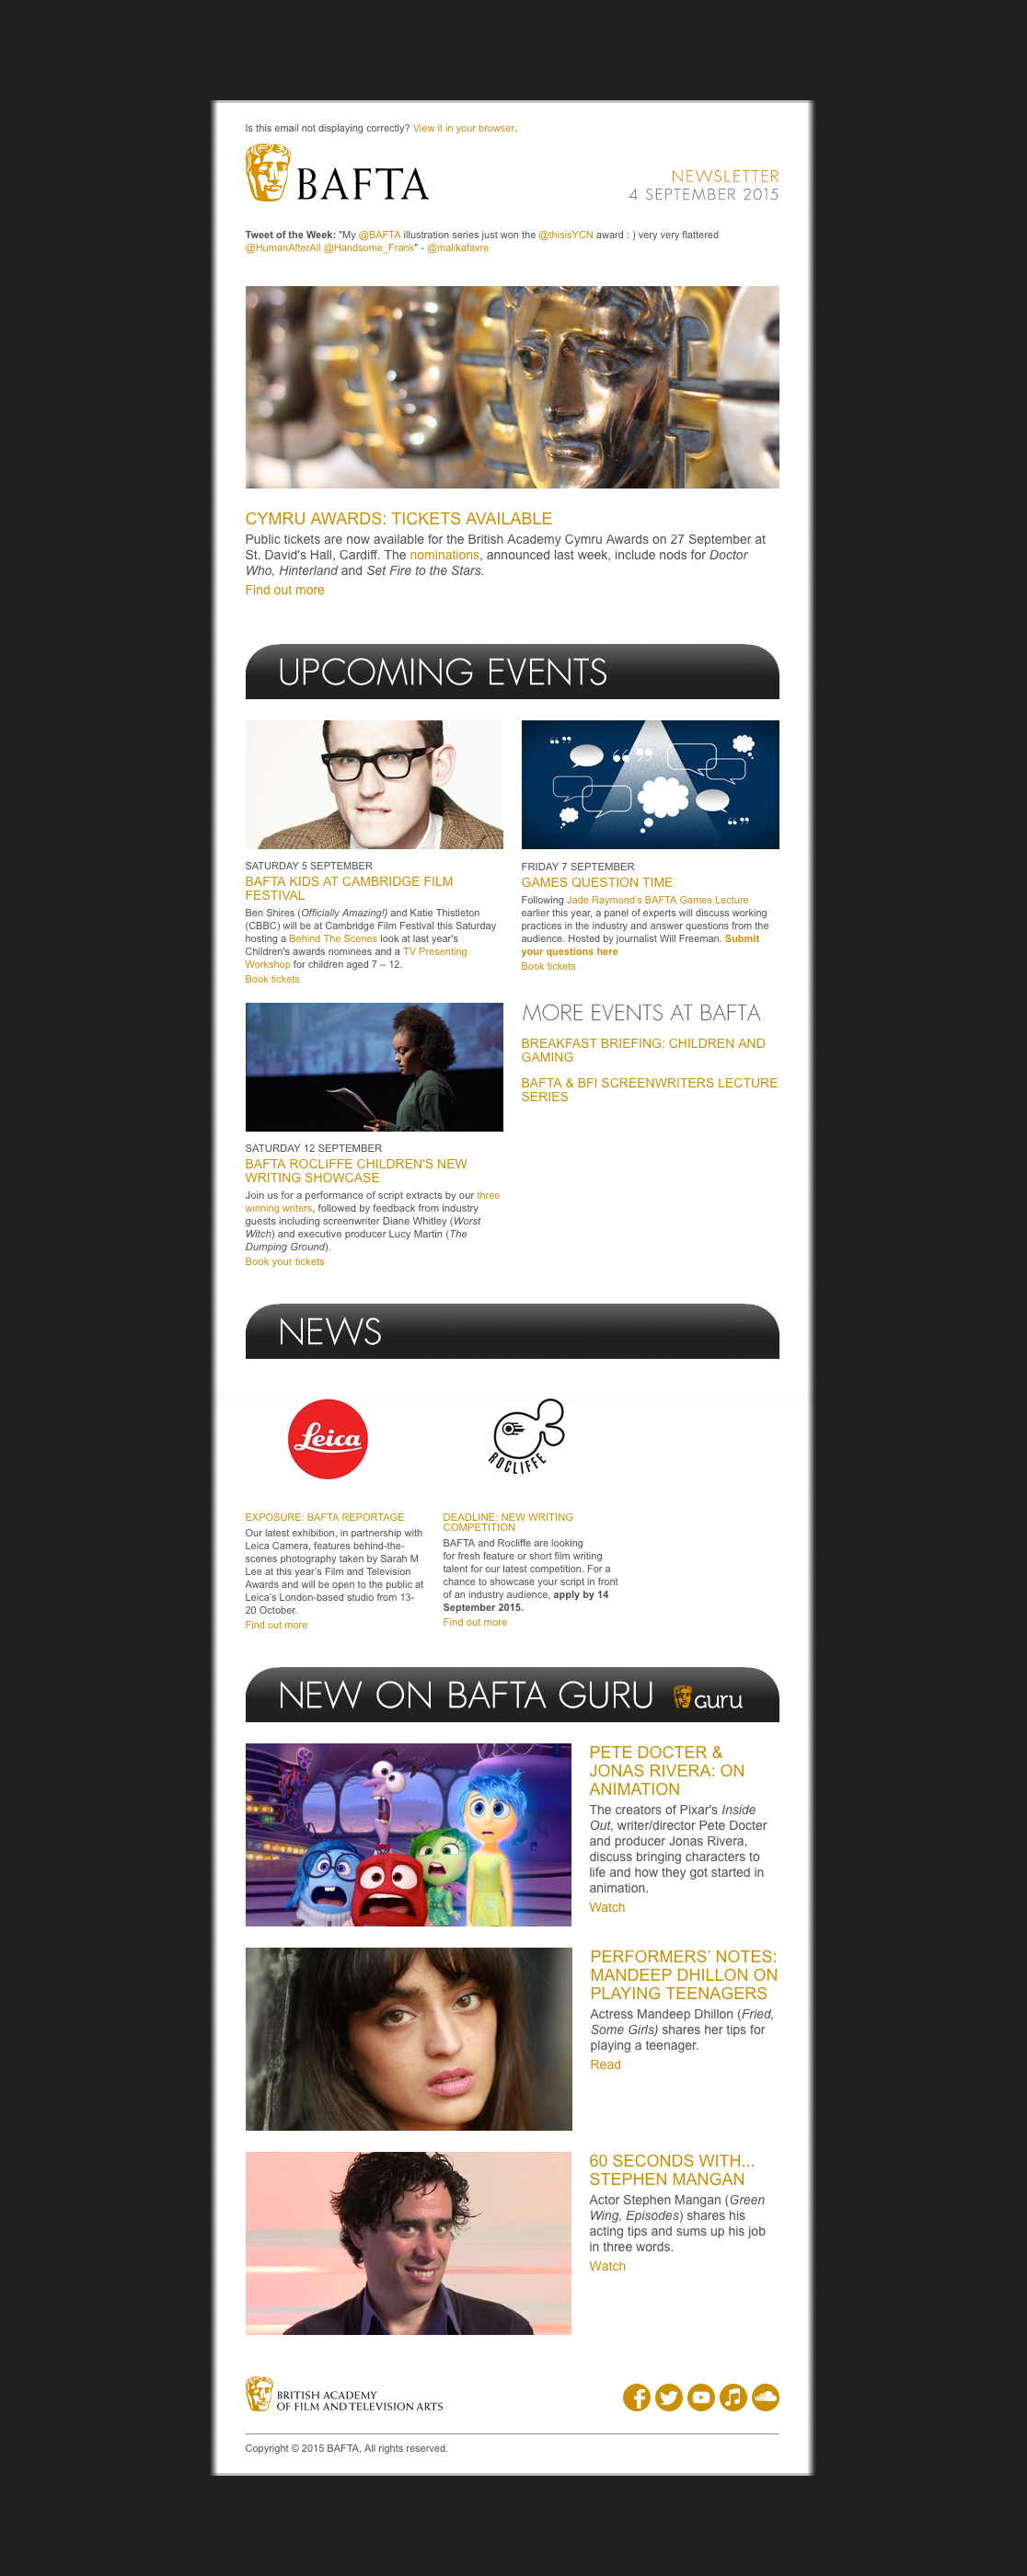 bafta HTML email marketing